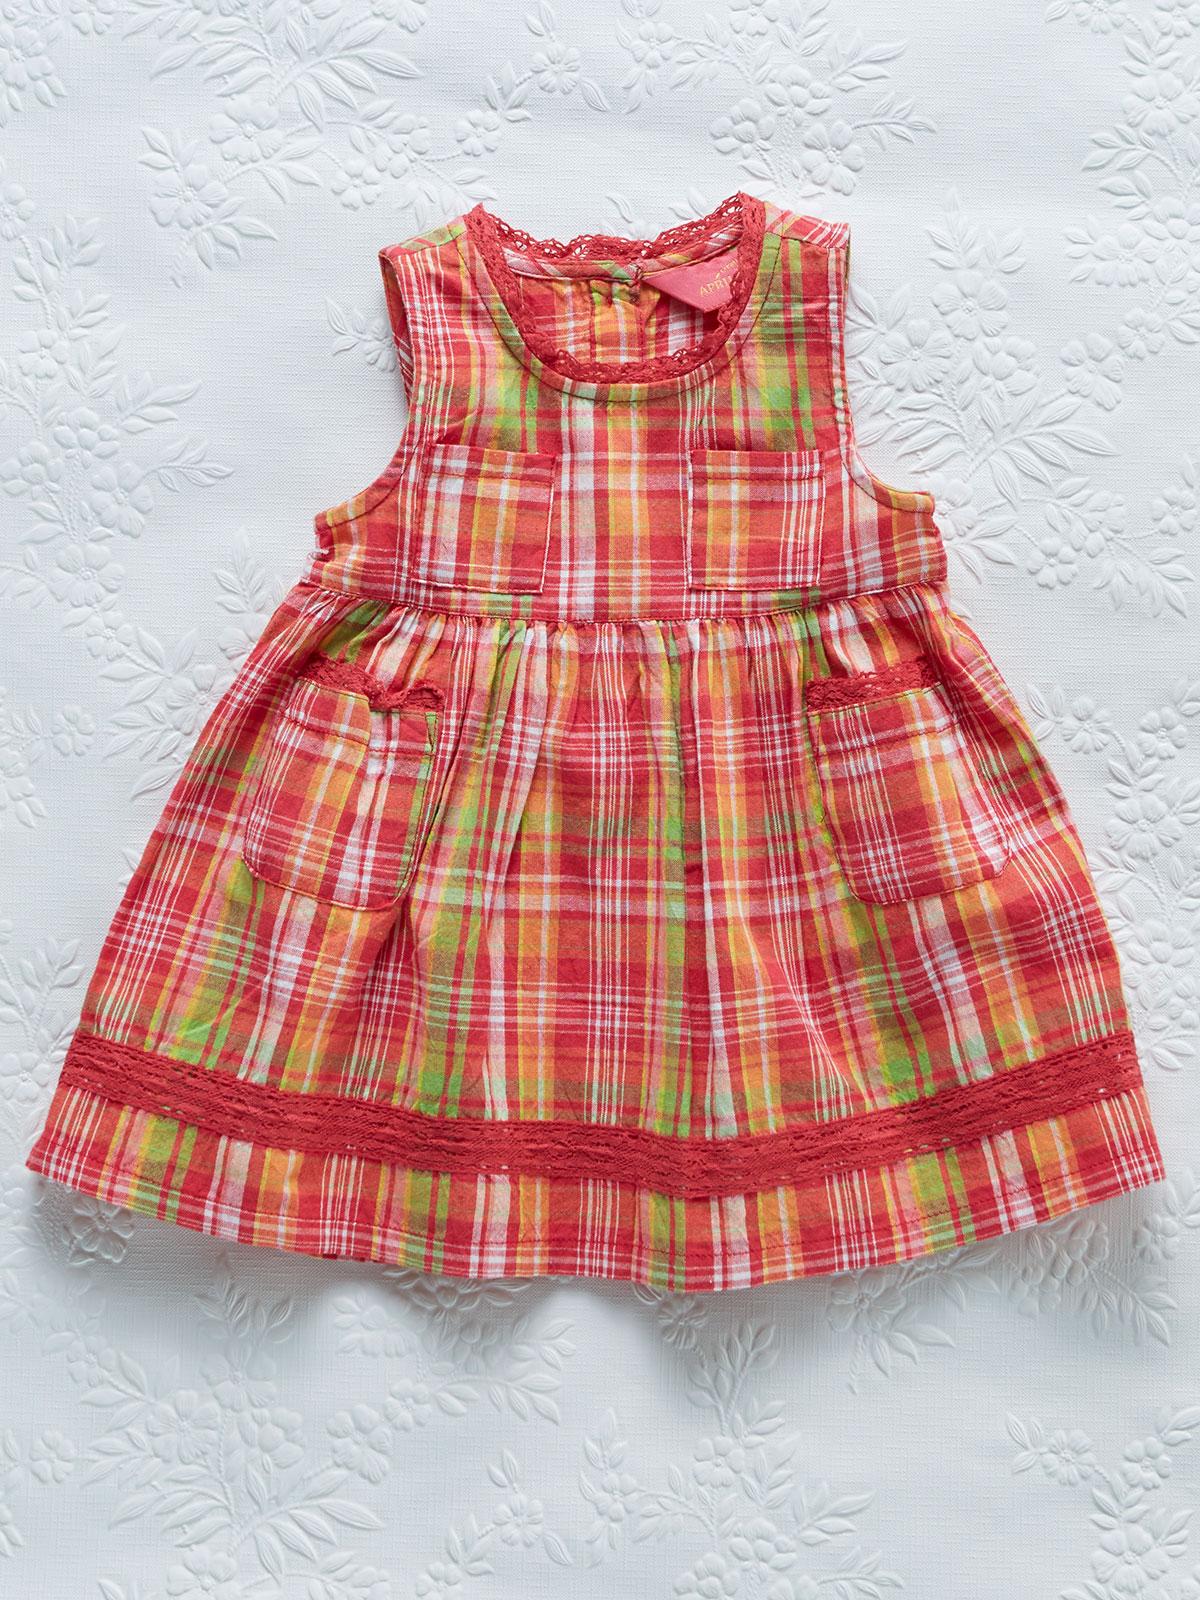 Watermelon Plaid Baby Dress